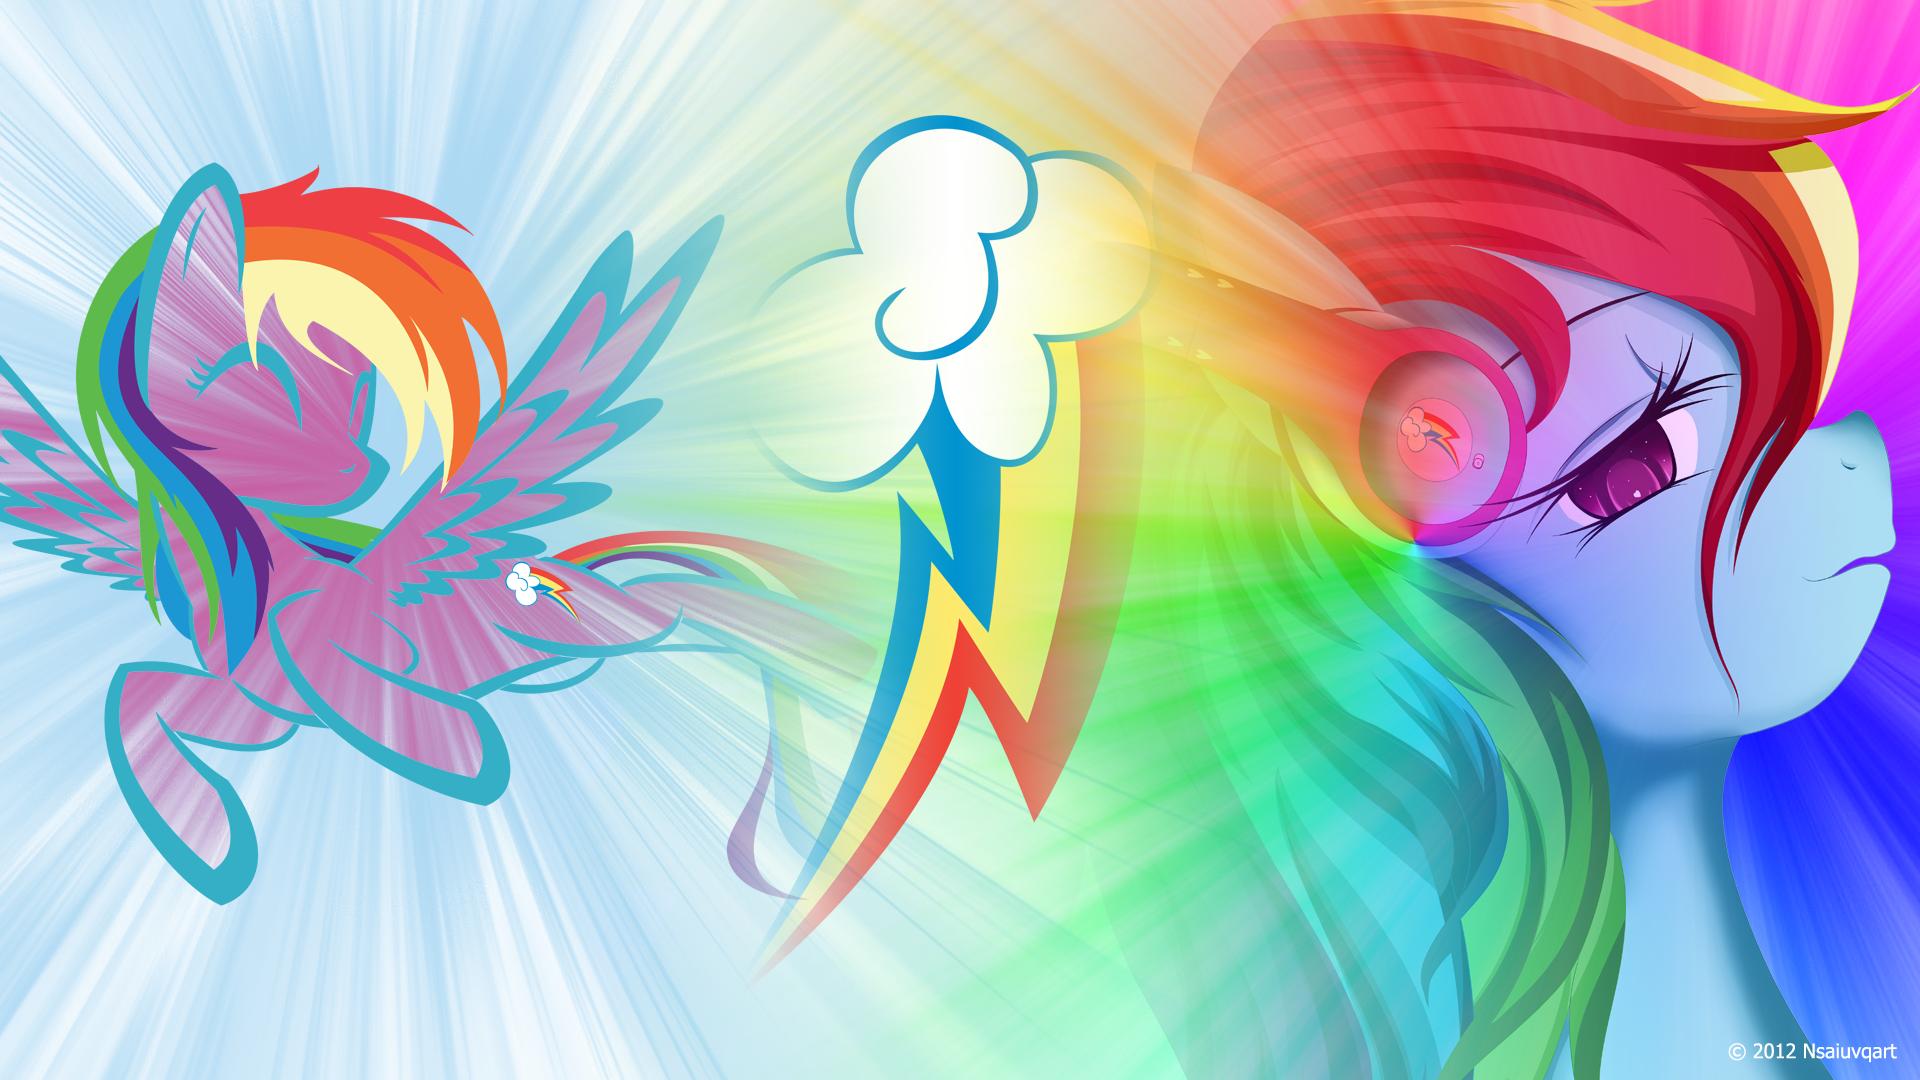 Rainbow Dash likes listening to music Wallpaper by nsaiuvqart